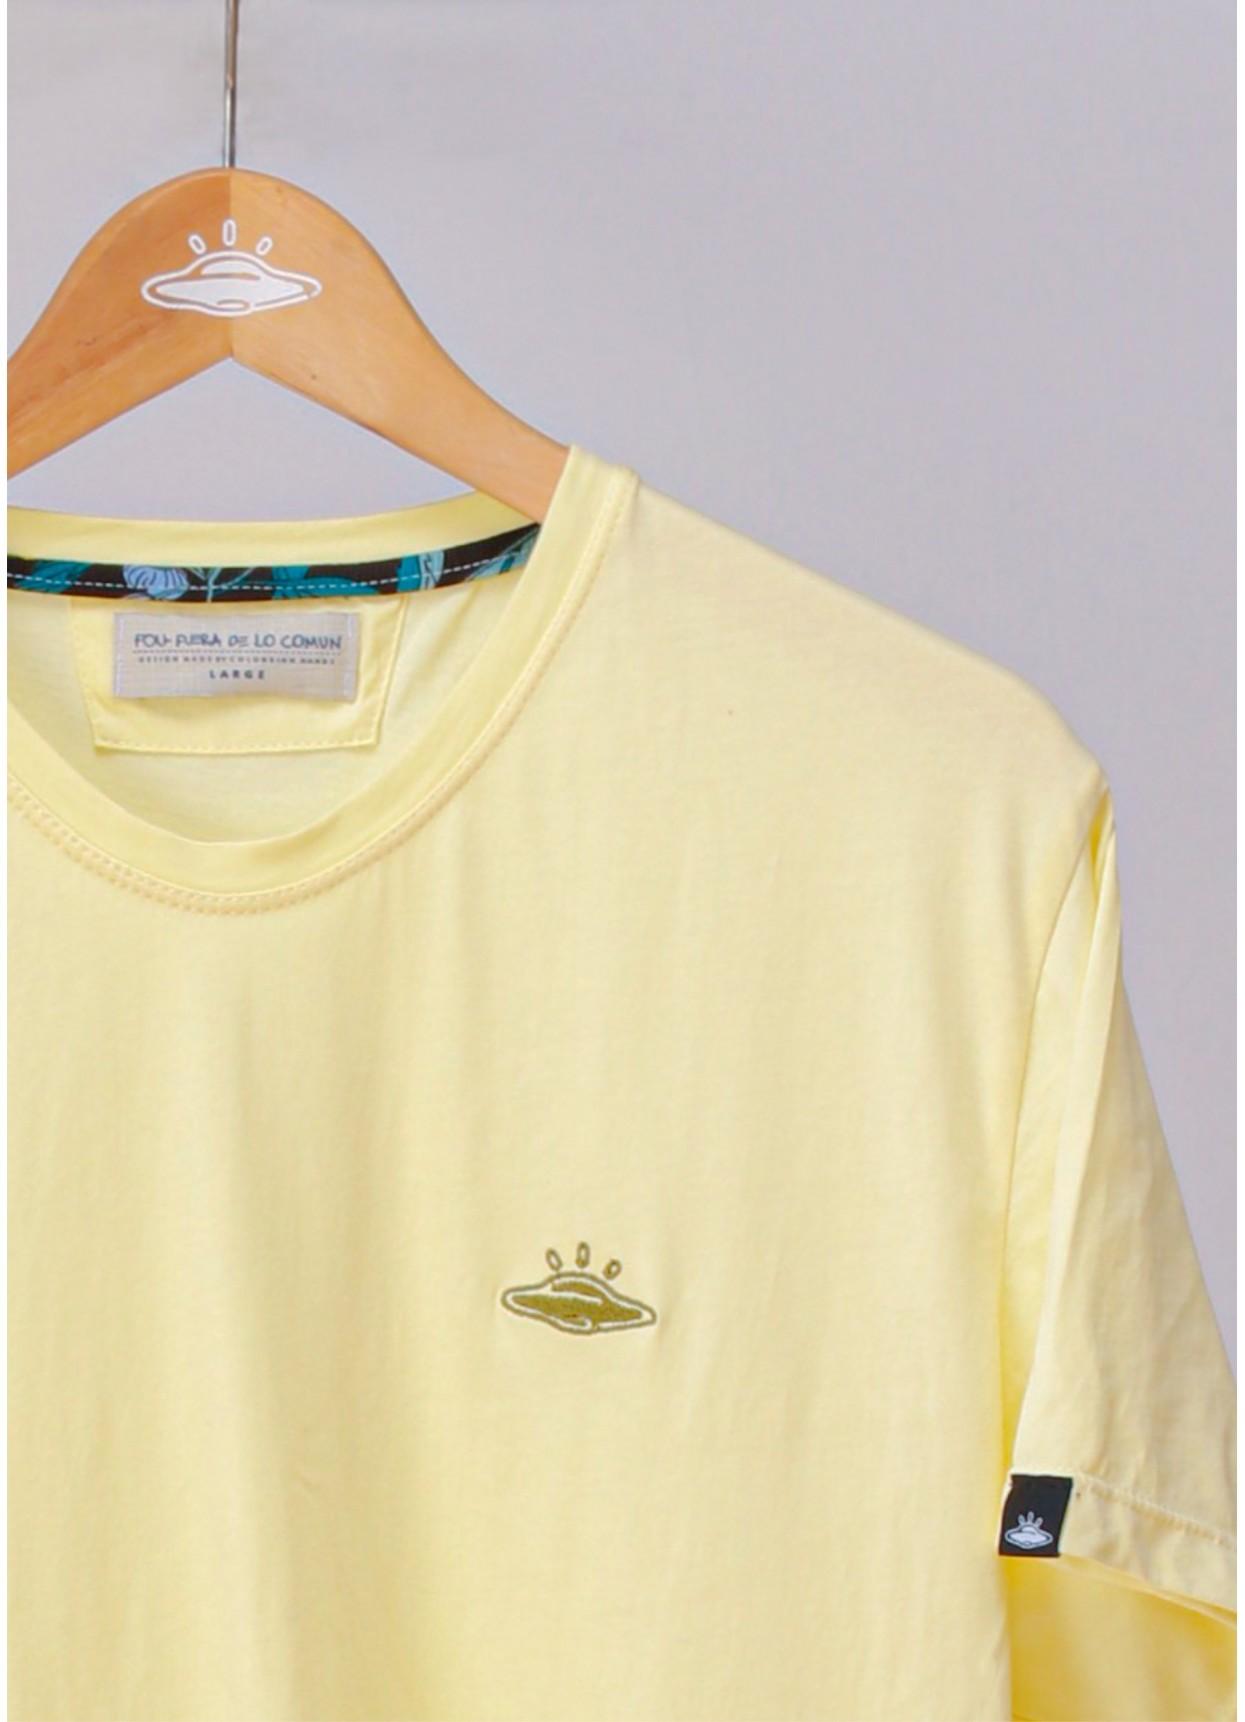 Camiseta básica de hombre Ovni Yellow.